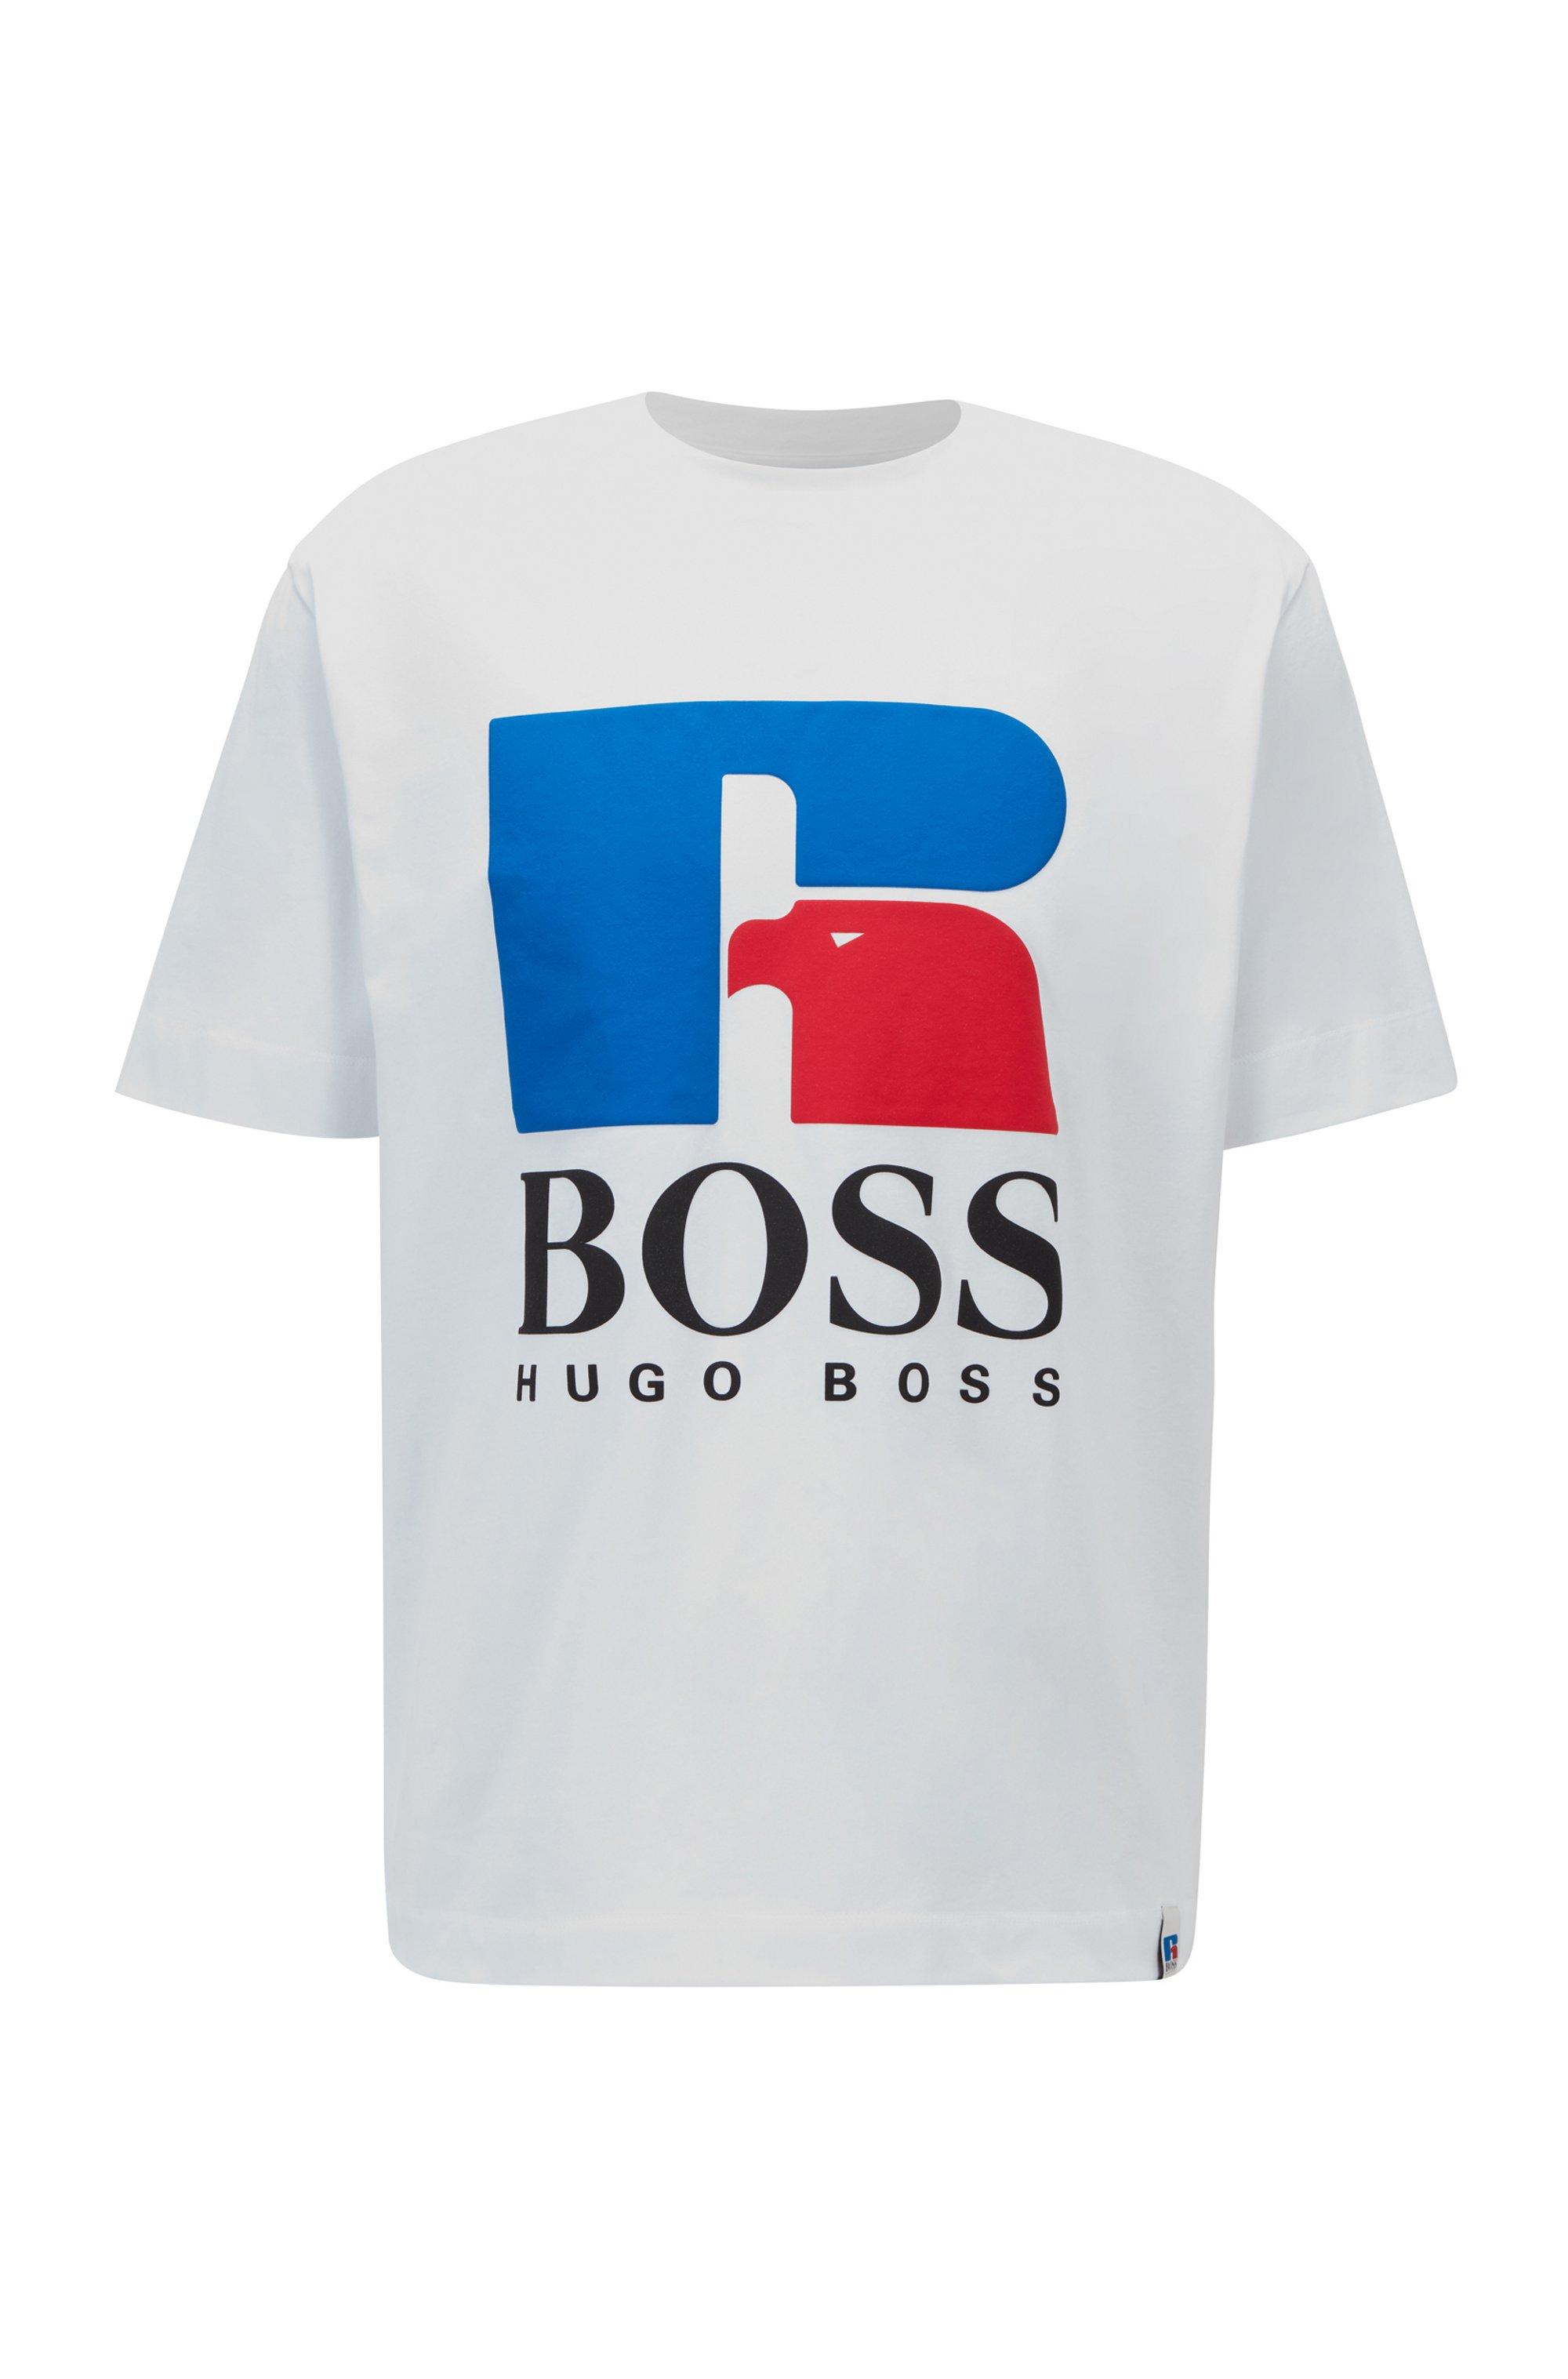 T-shirt mixte Relaxed Fit en coton stretch à logo exclusif, Blanc